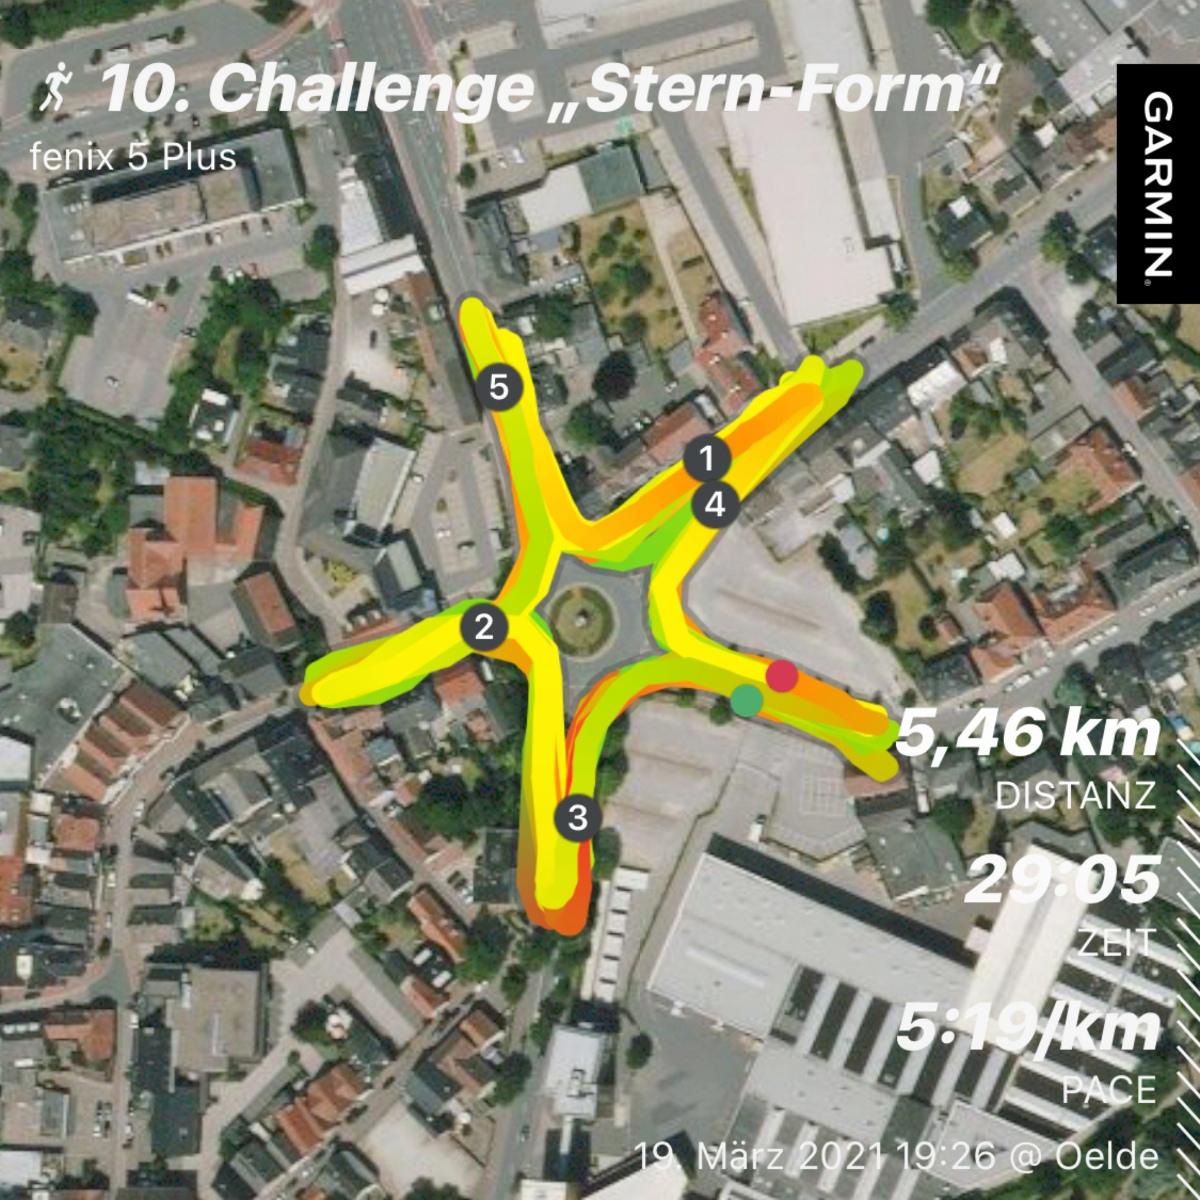 Reckmann-Dany-10-Challenge-Stern-Form-Z2UIc